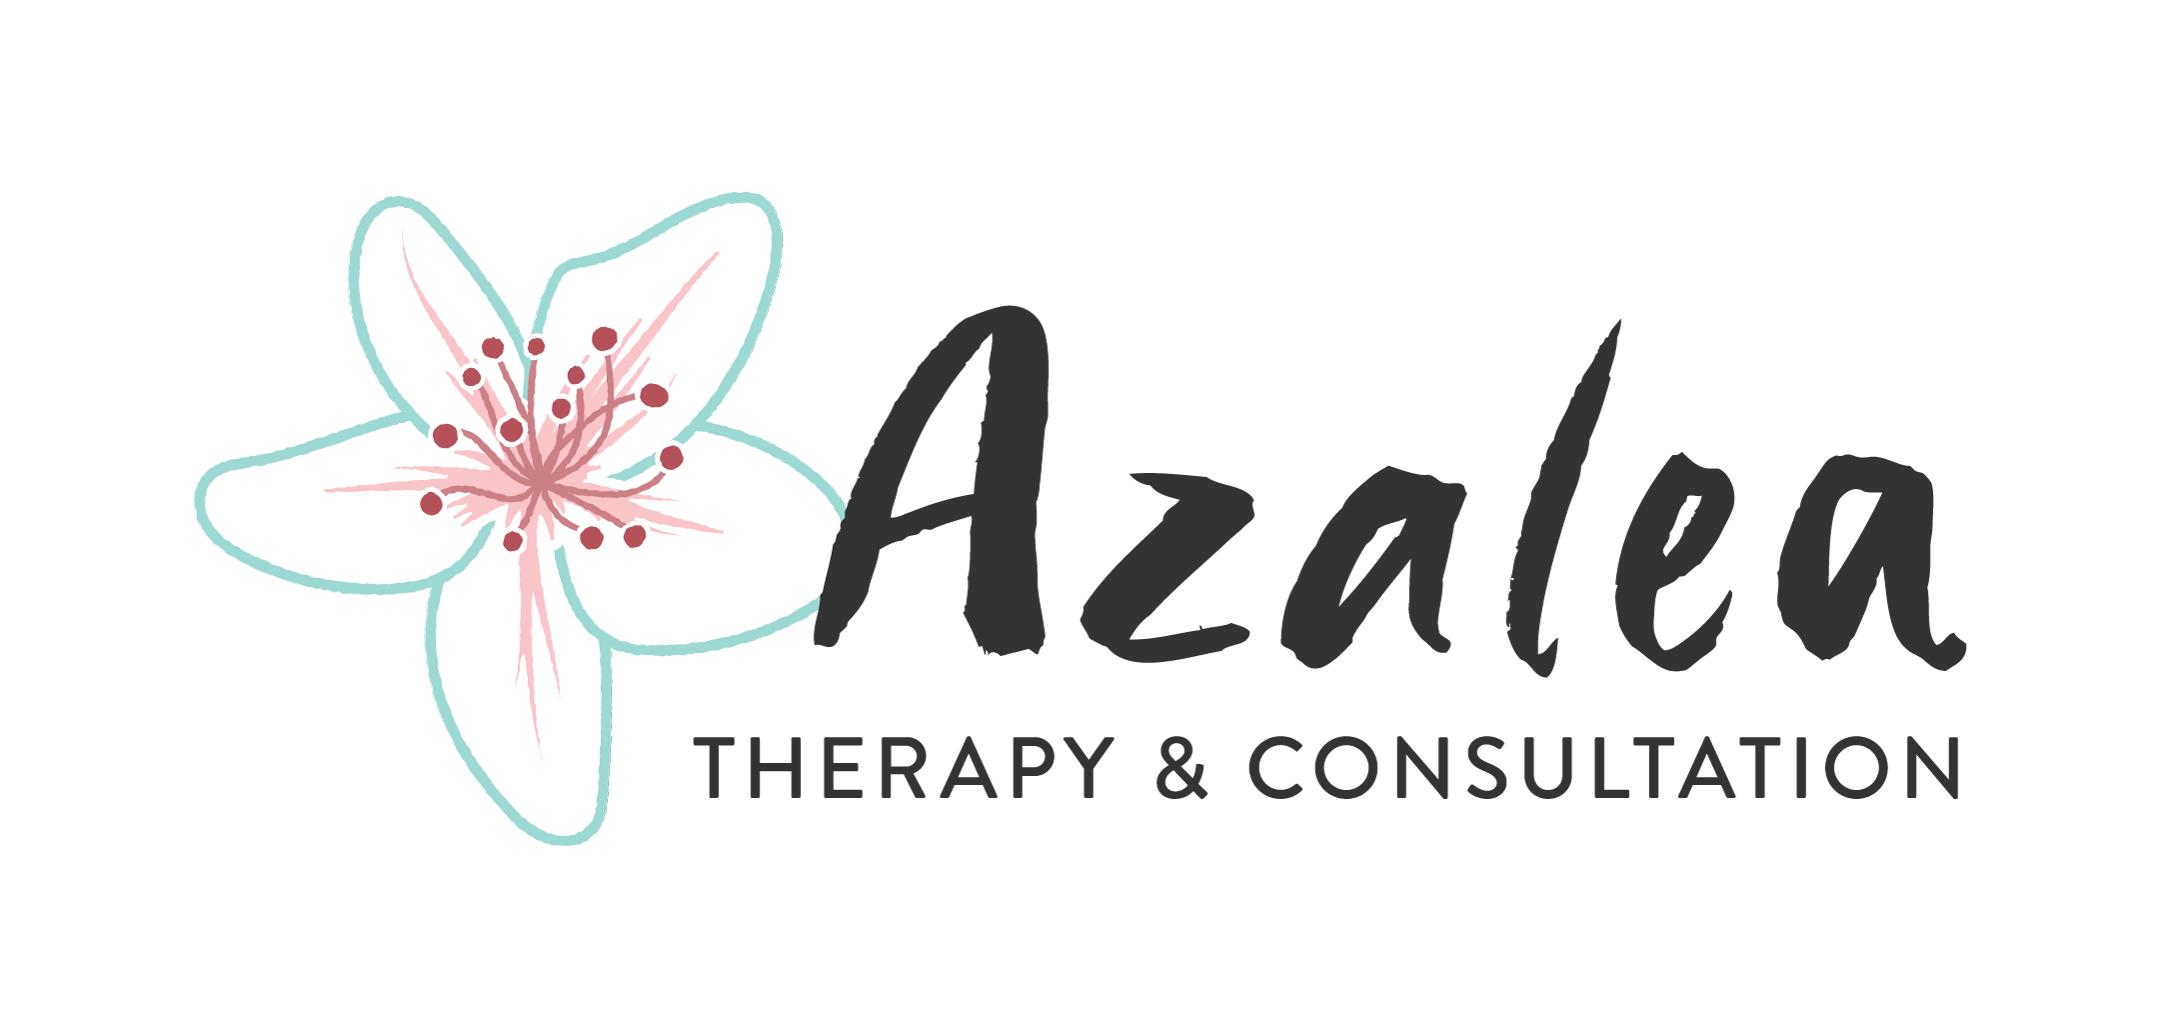 Azalea Therapy and Consultation Services logo